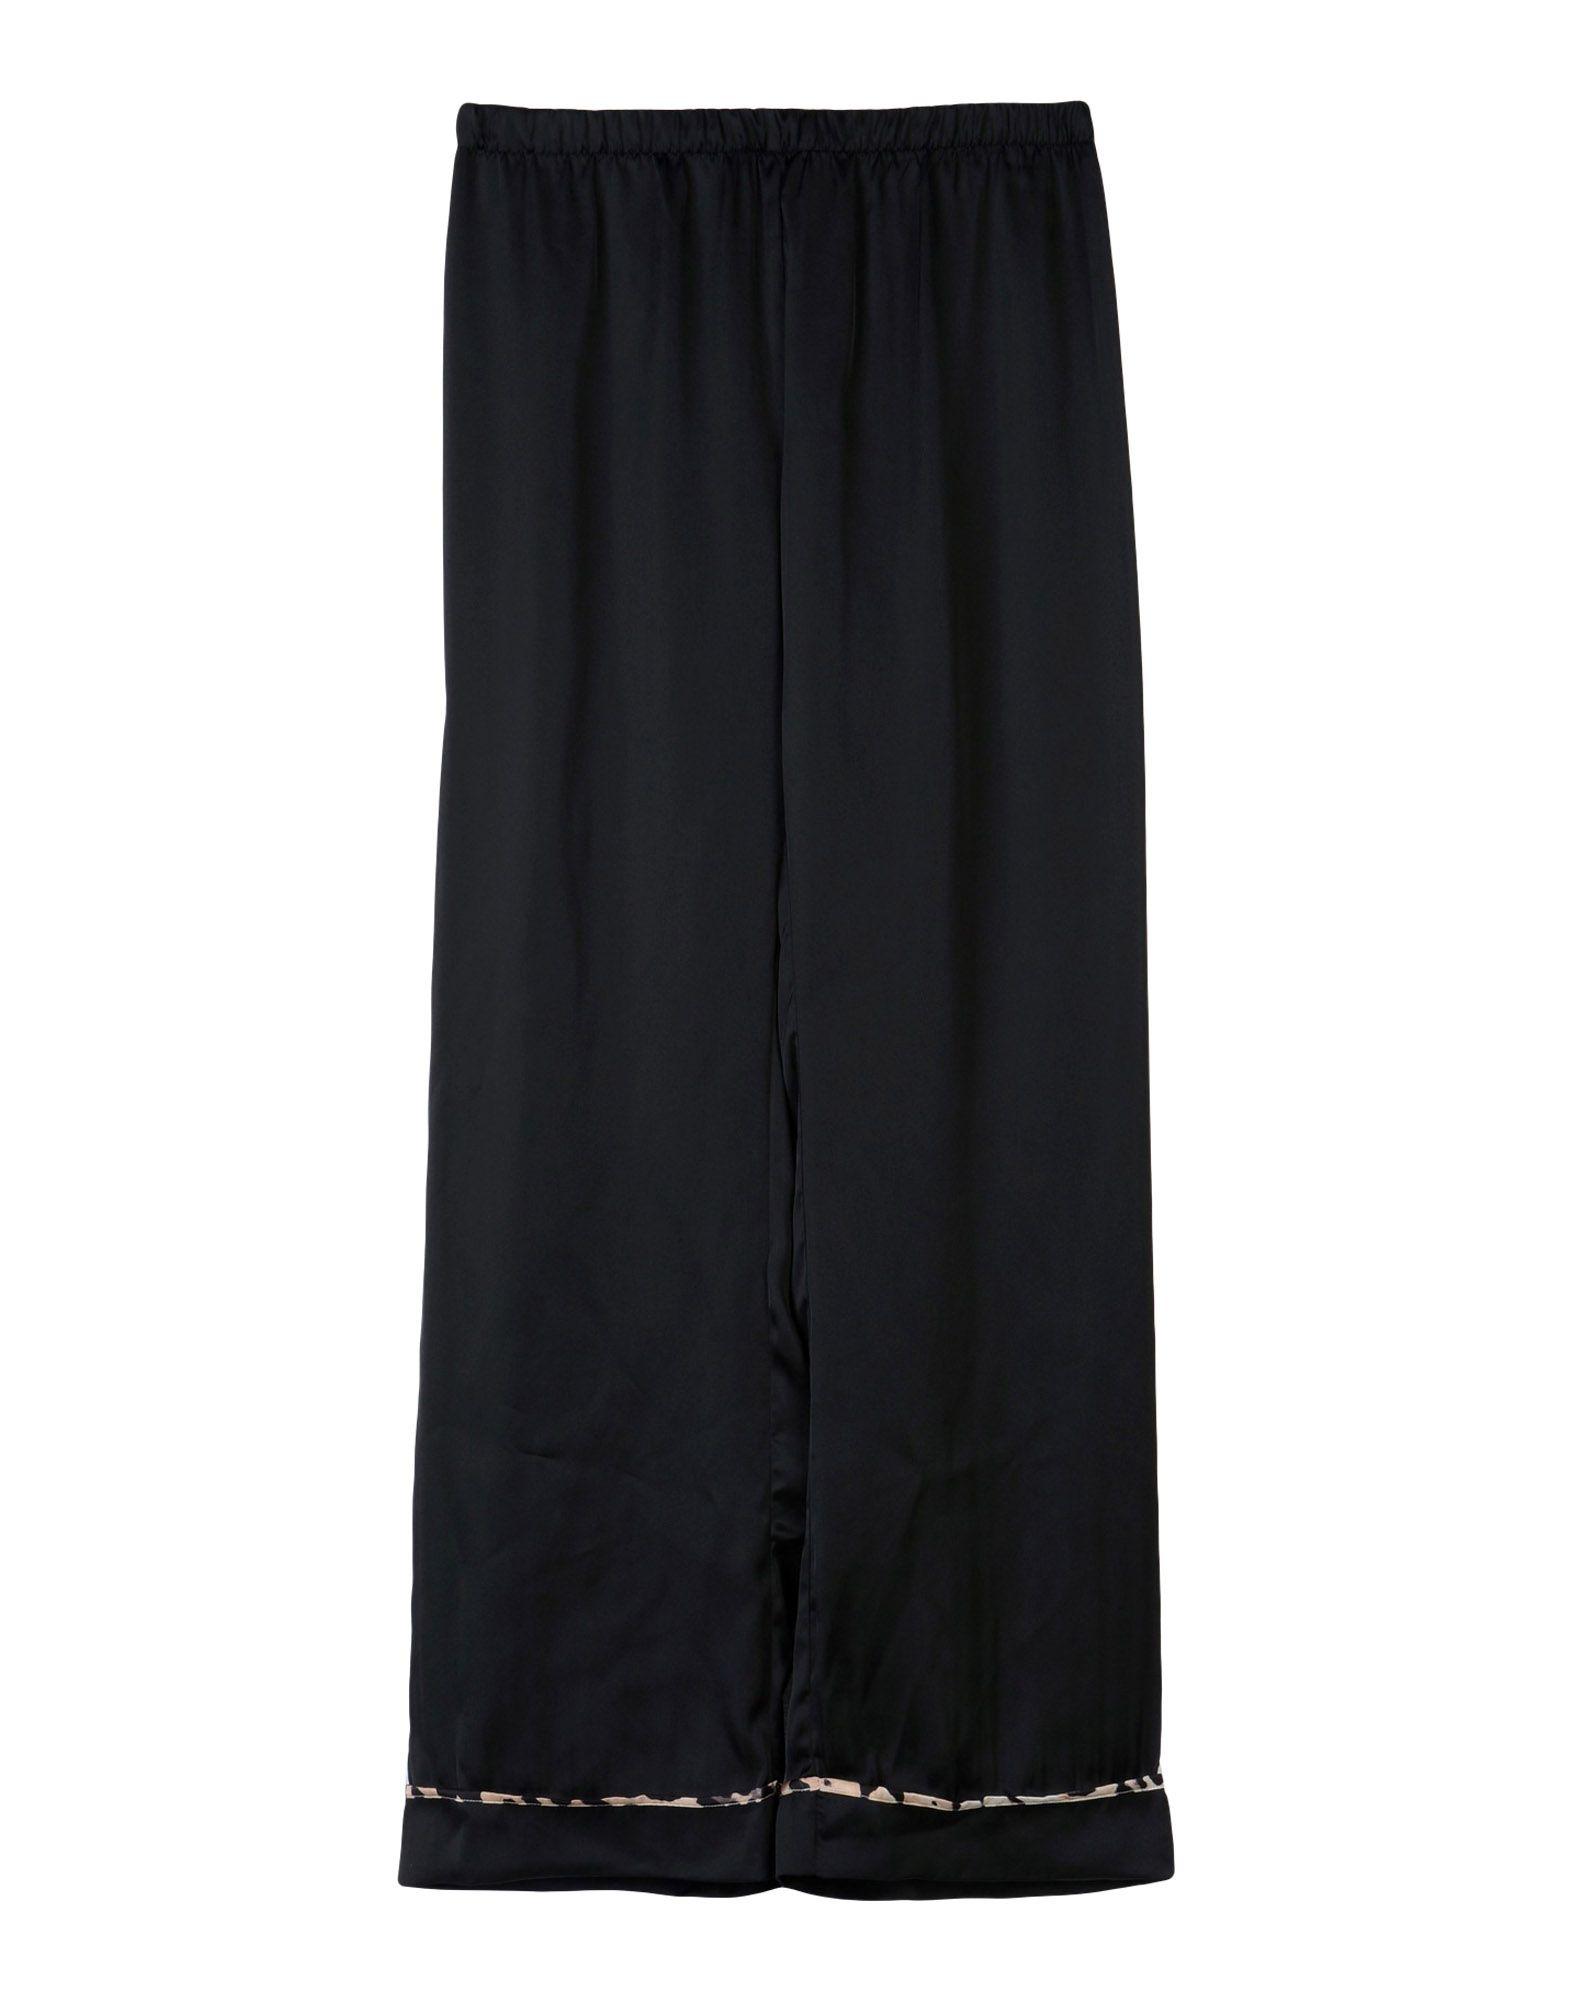 BLUGIRL BLUMARINE UNDERWEAR Sleepwear